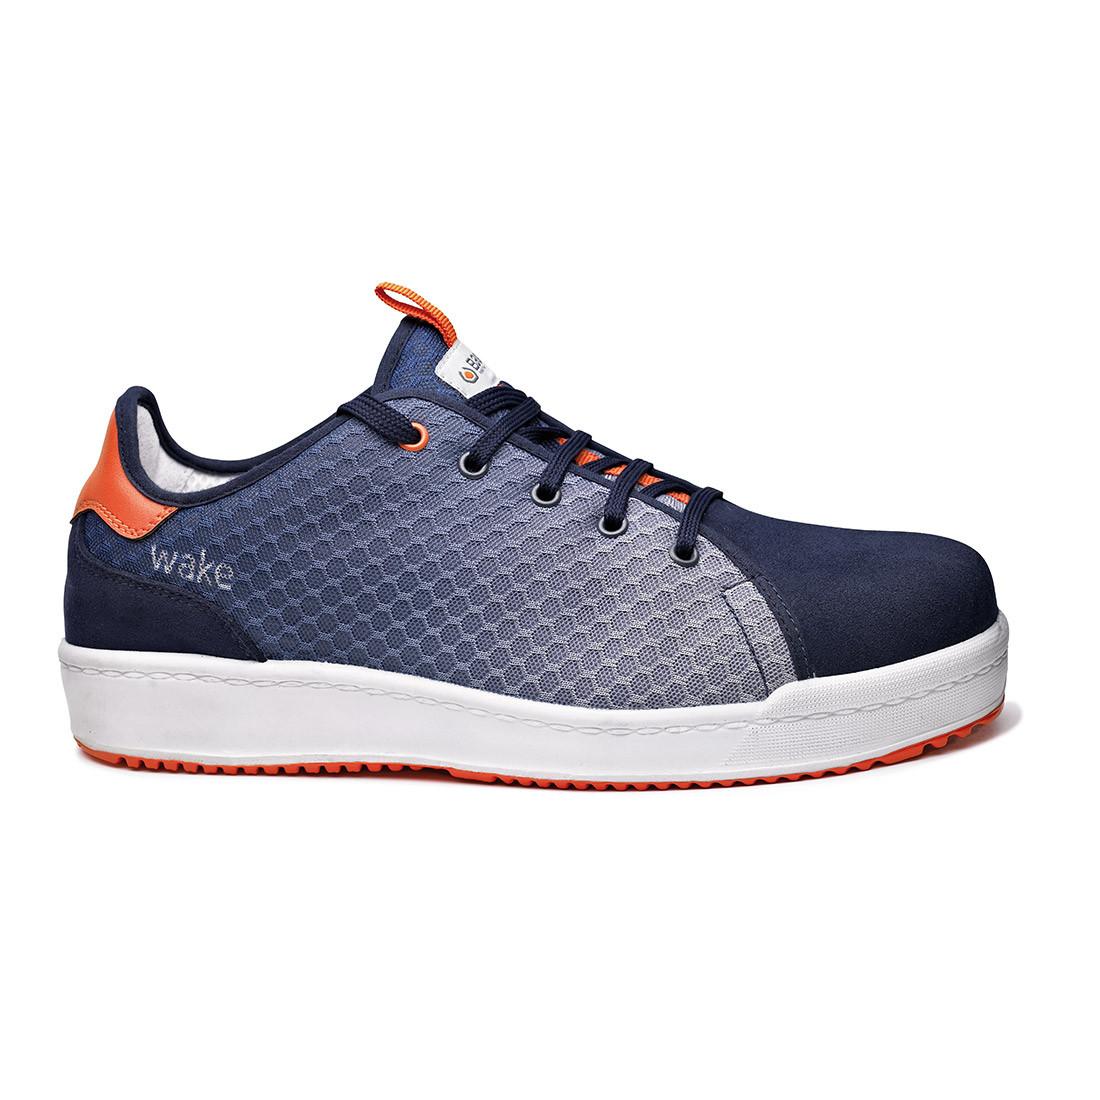 Pantofi Wake S1P SRC - Incaltaminte de protectie